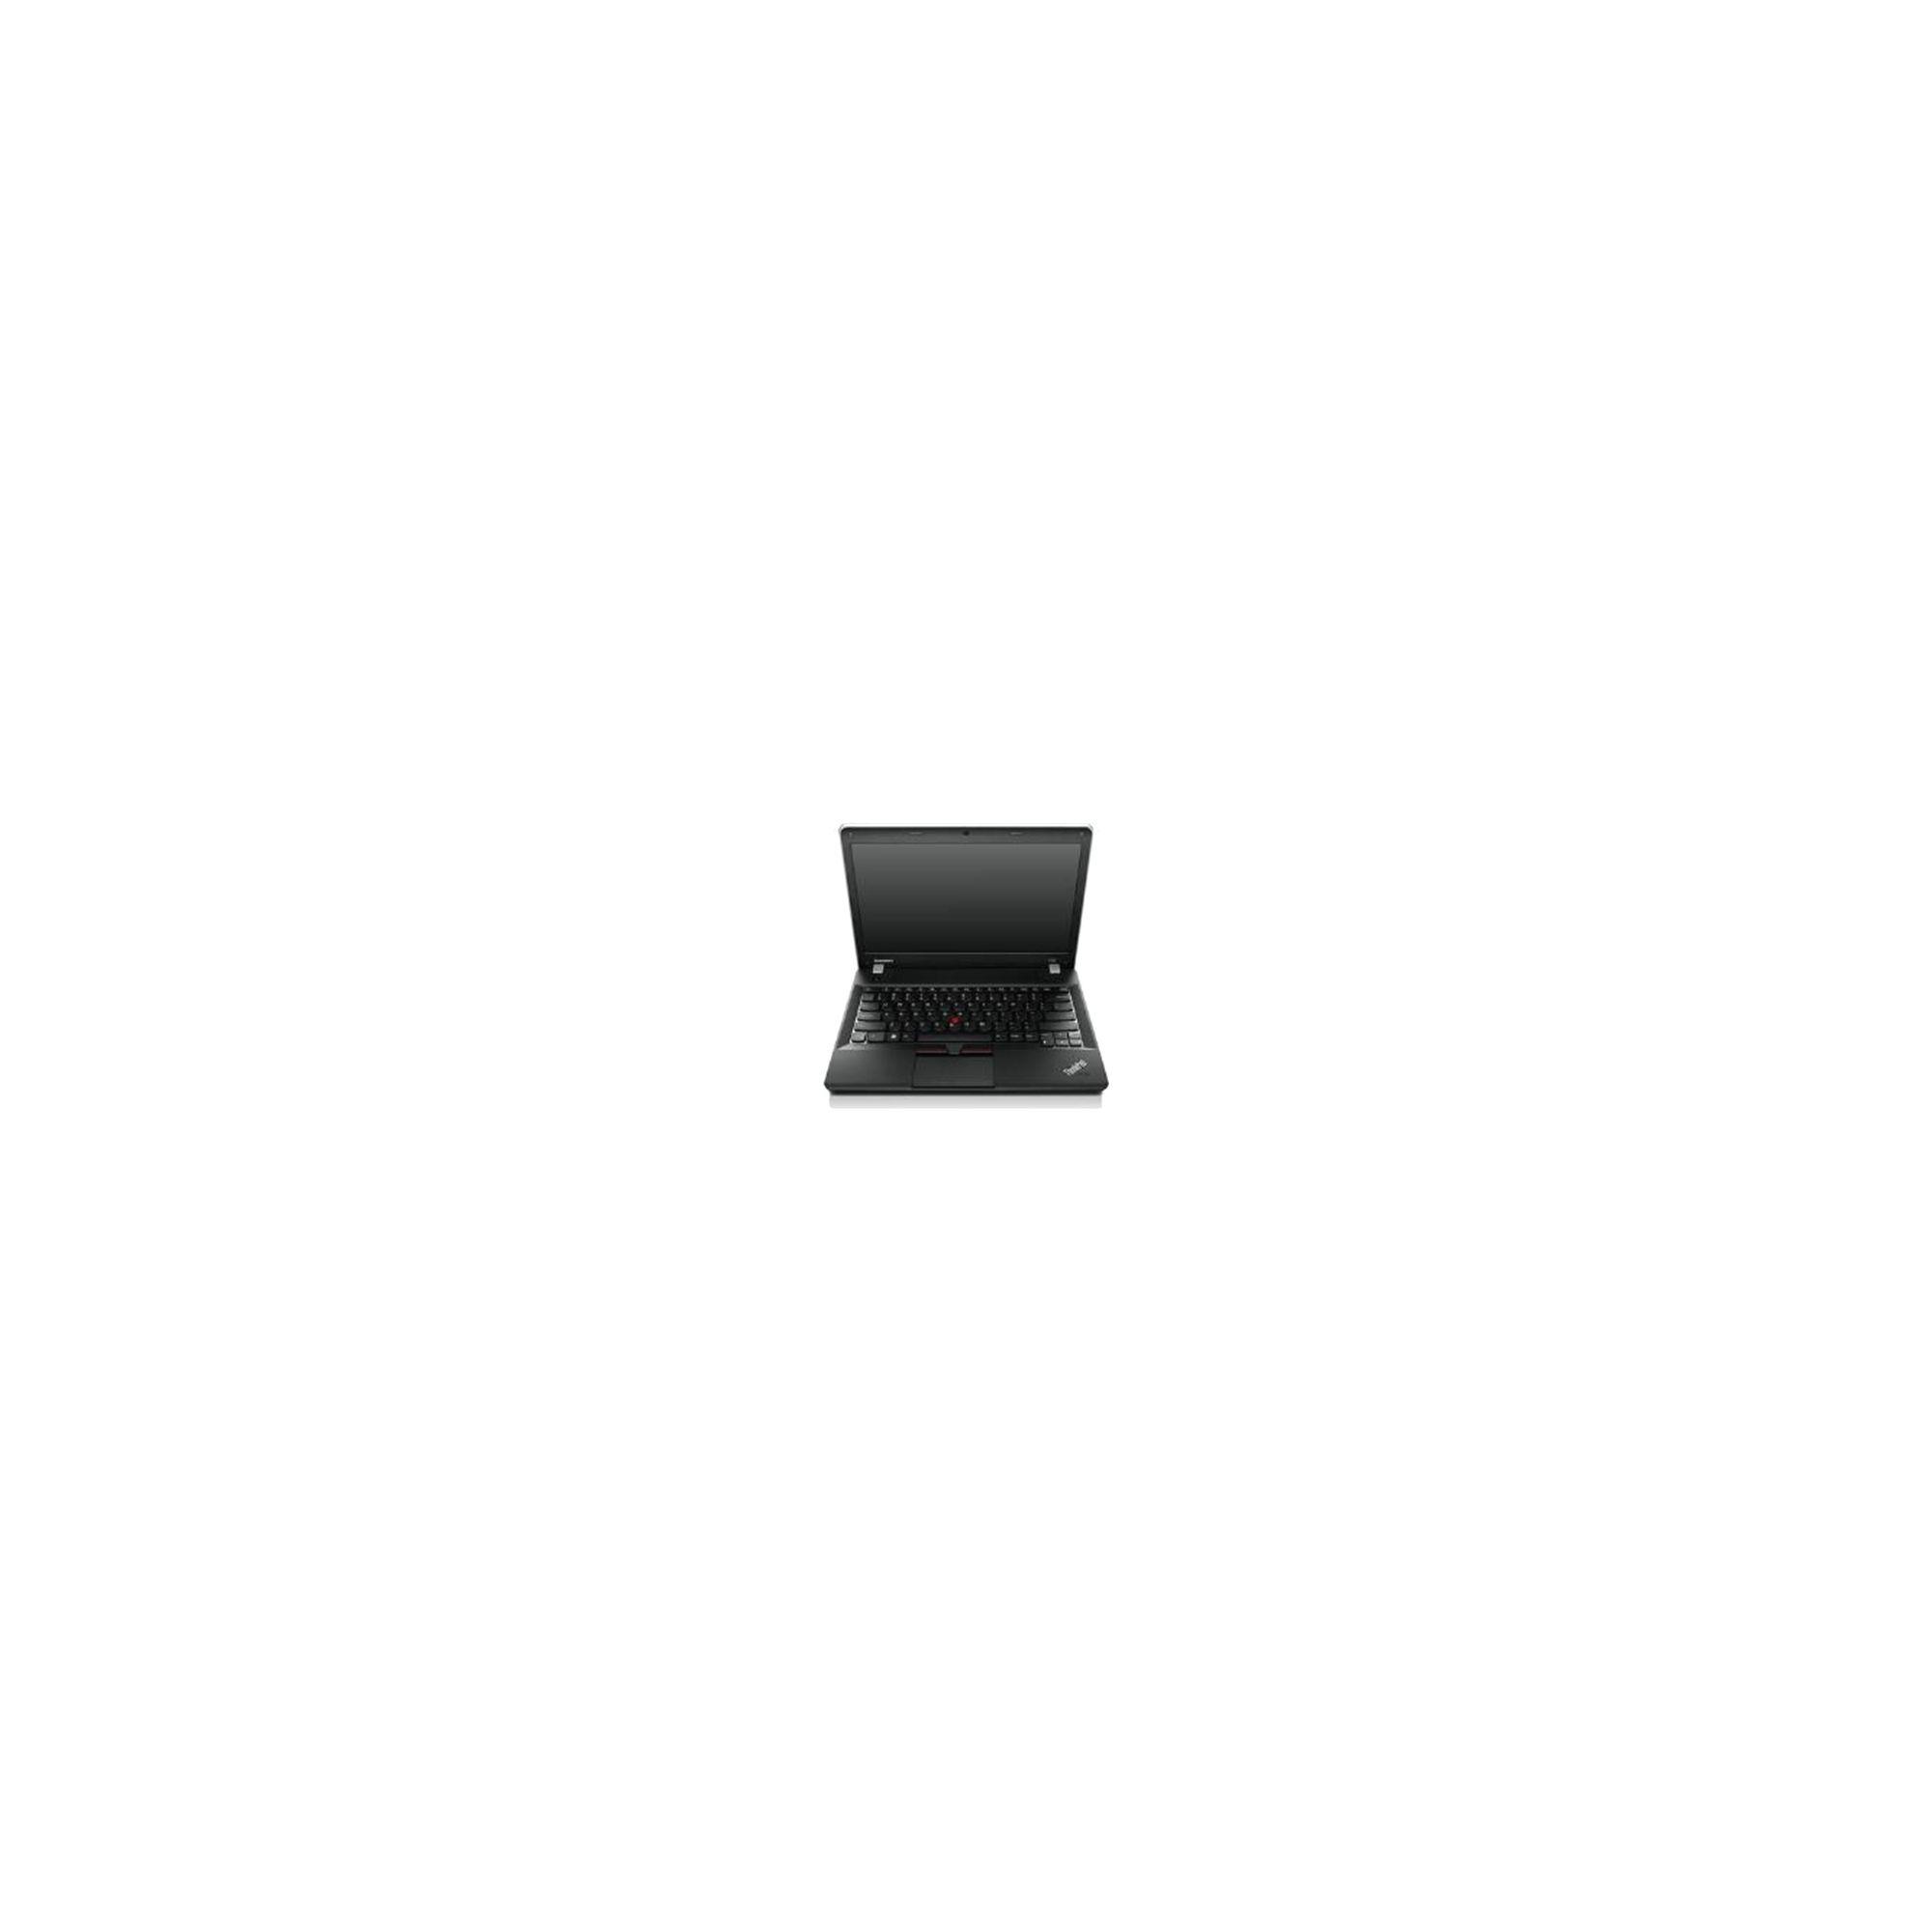 Lenovo ThinkPad Edge E335 33556AG (13.3 inch) Notebook AMD (E2-1800) 1.7GHz 4GB 320GB WLAN BT Webcam Windows 7 Pro 64-bit/Windows 8 Pro 64-bit RDVD at Tesco Direct